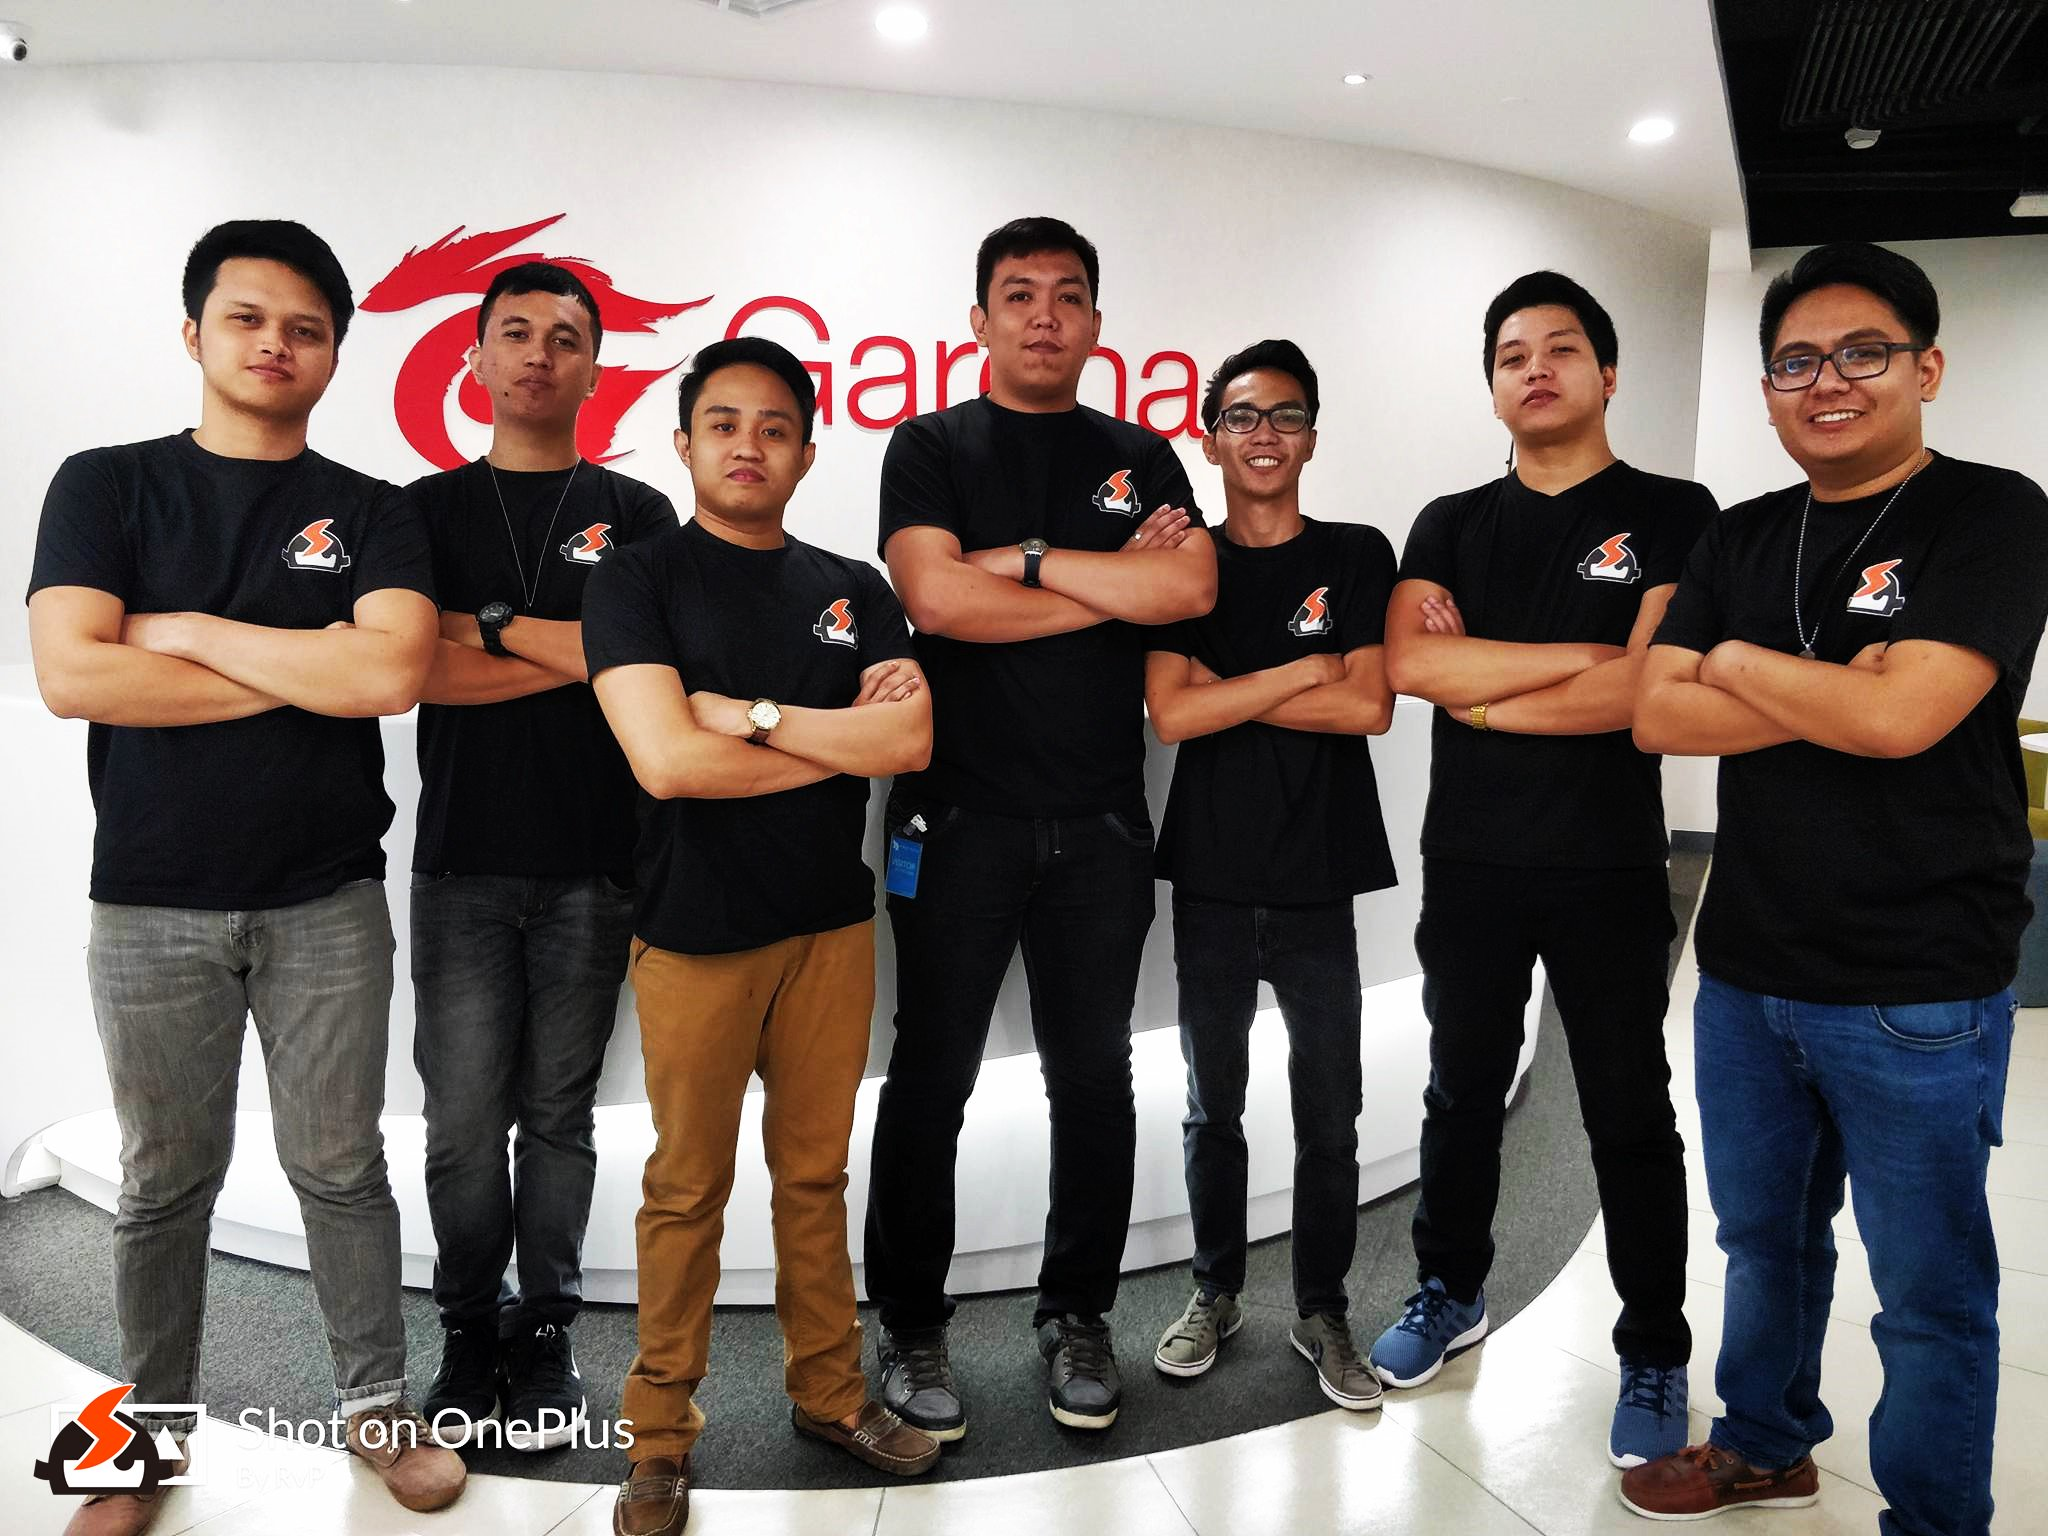 SG Halo team consisting of SG Jack, SG Qitz, SG RvP, SG Markky, SG Jrae, SG Jido, and SG Relax